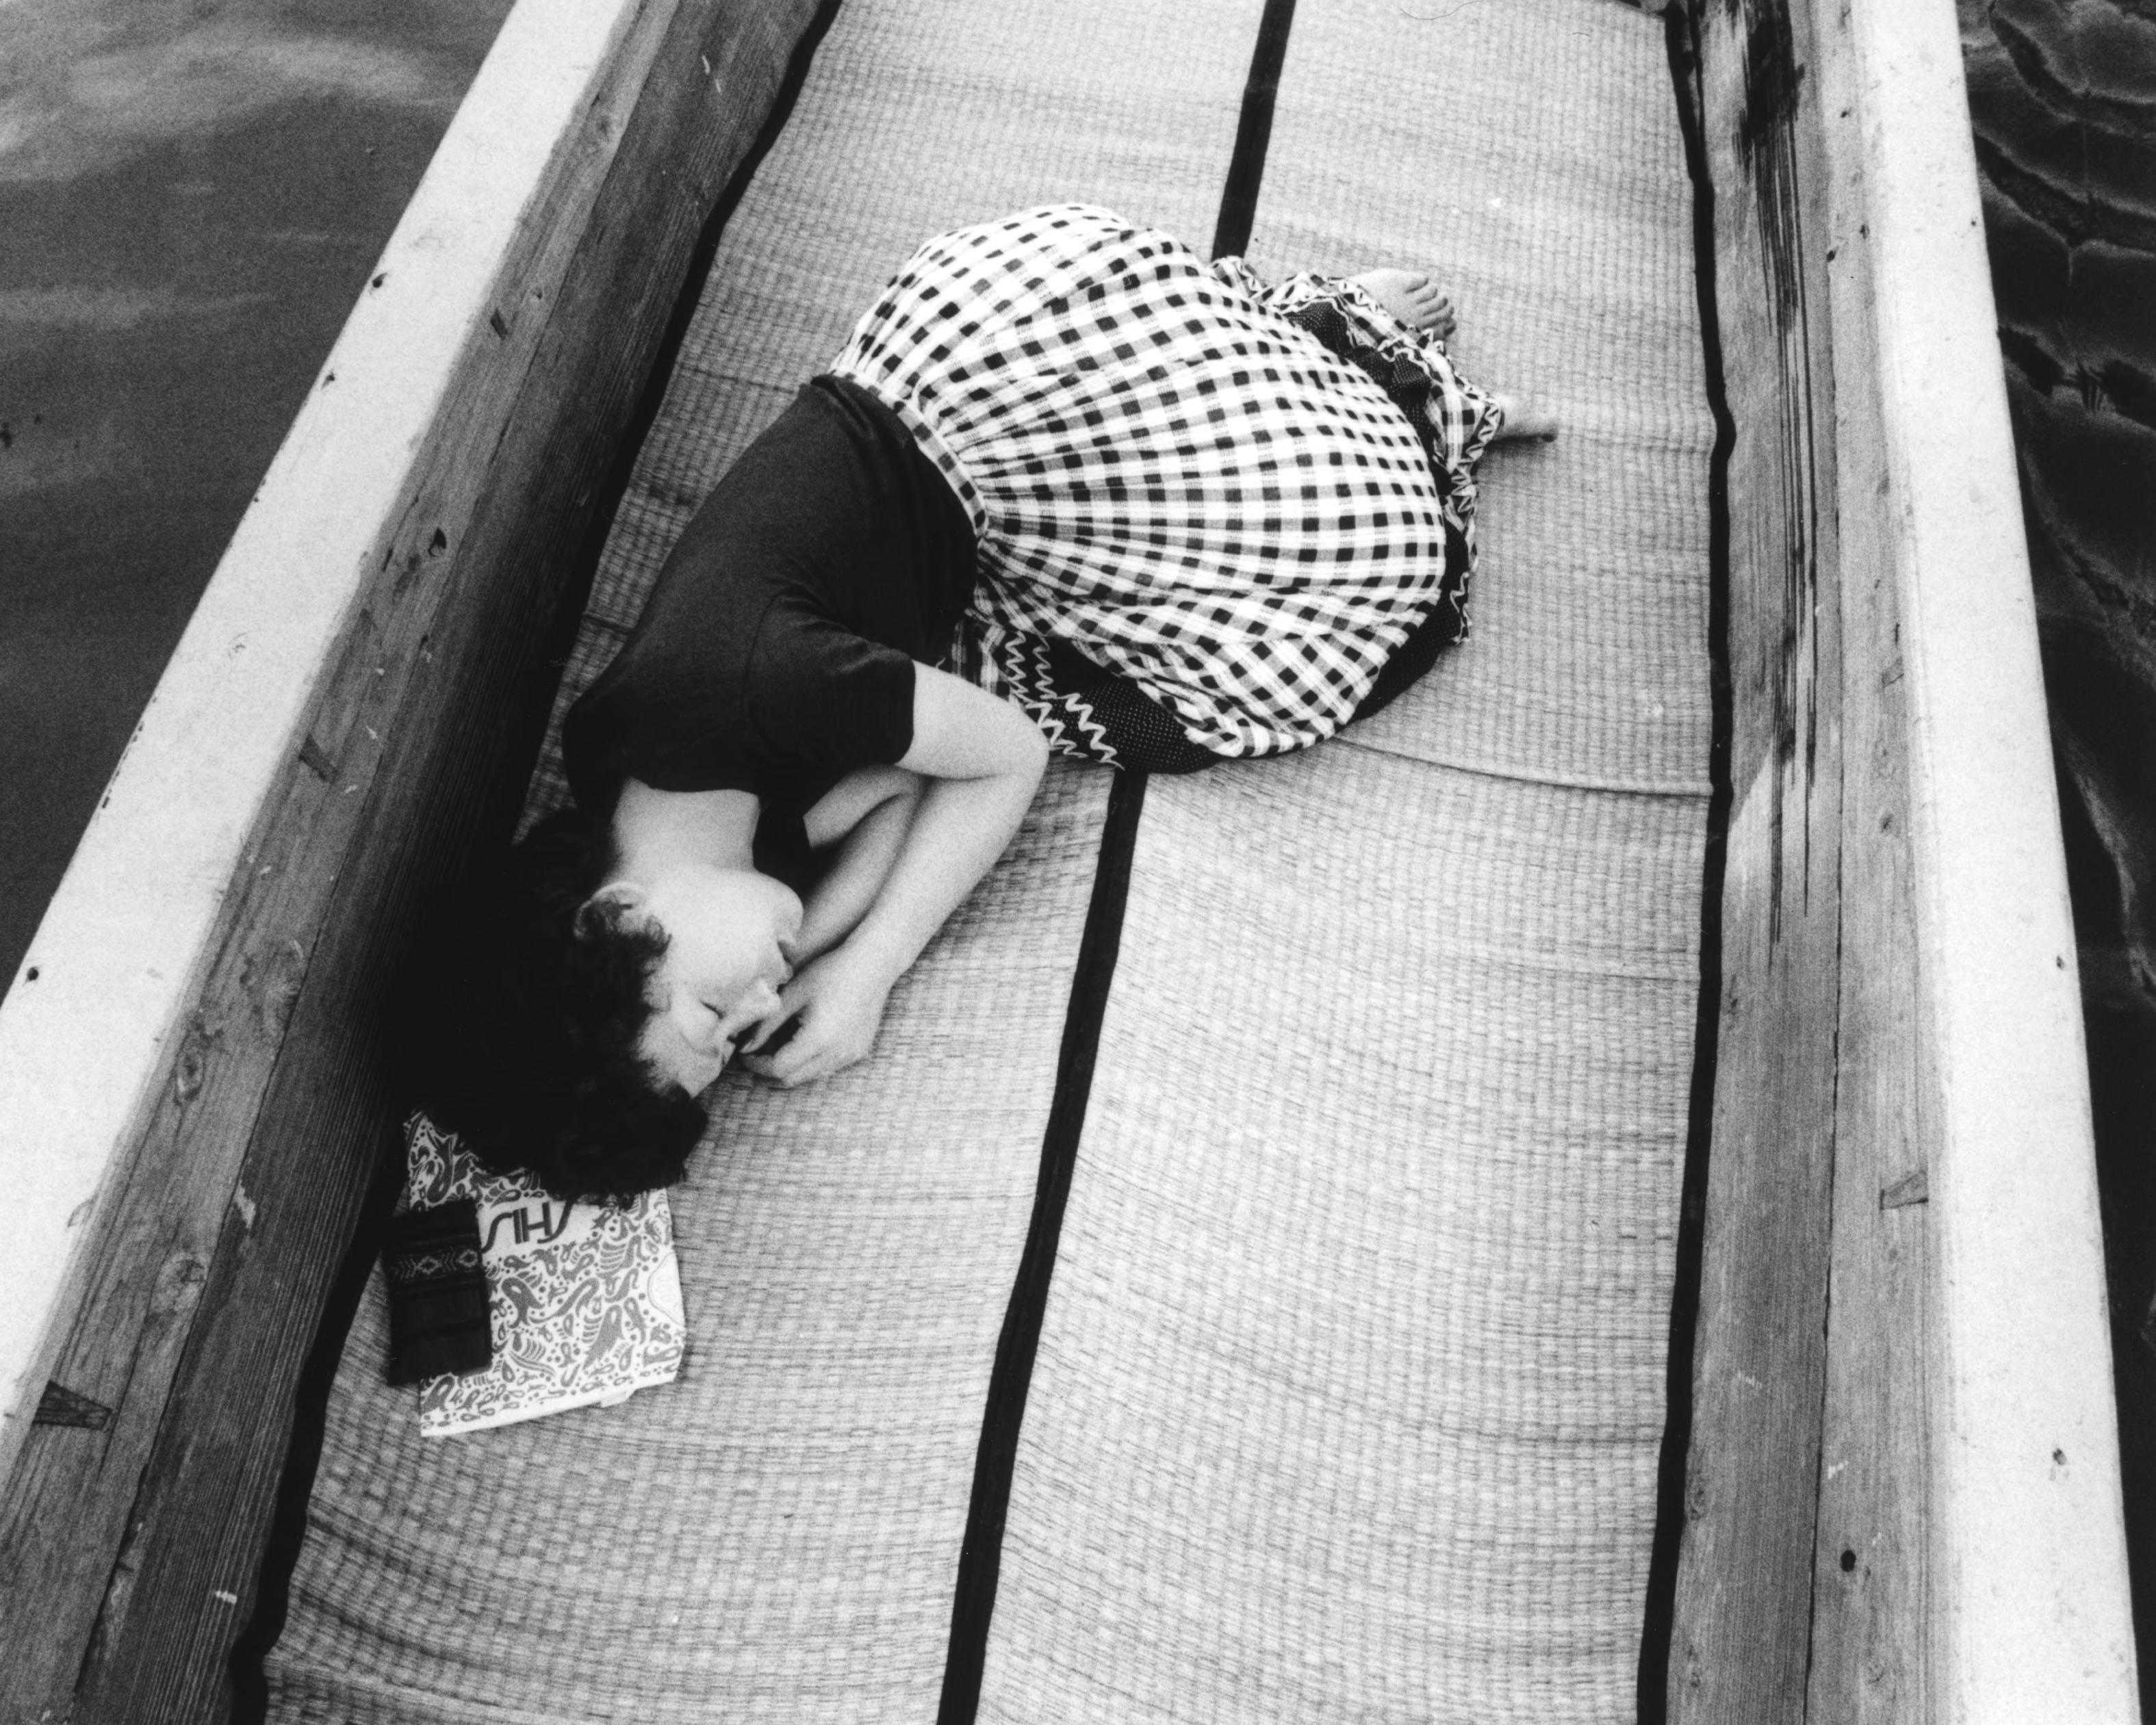 'Sentimental Journey', 1971, Photo by Araki